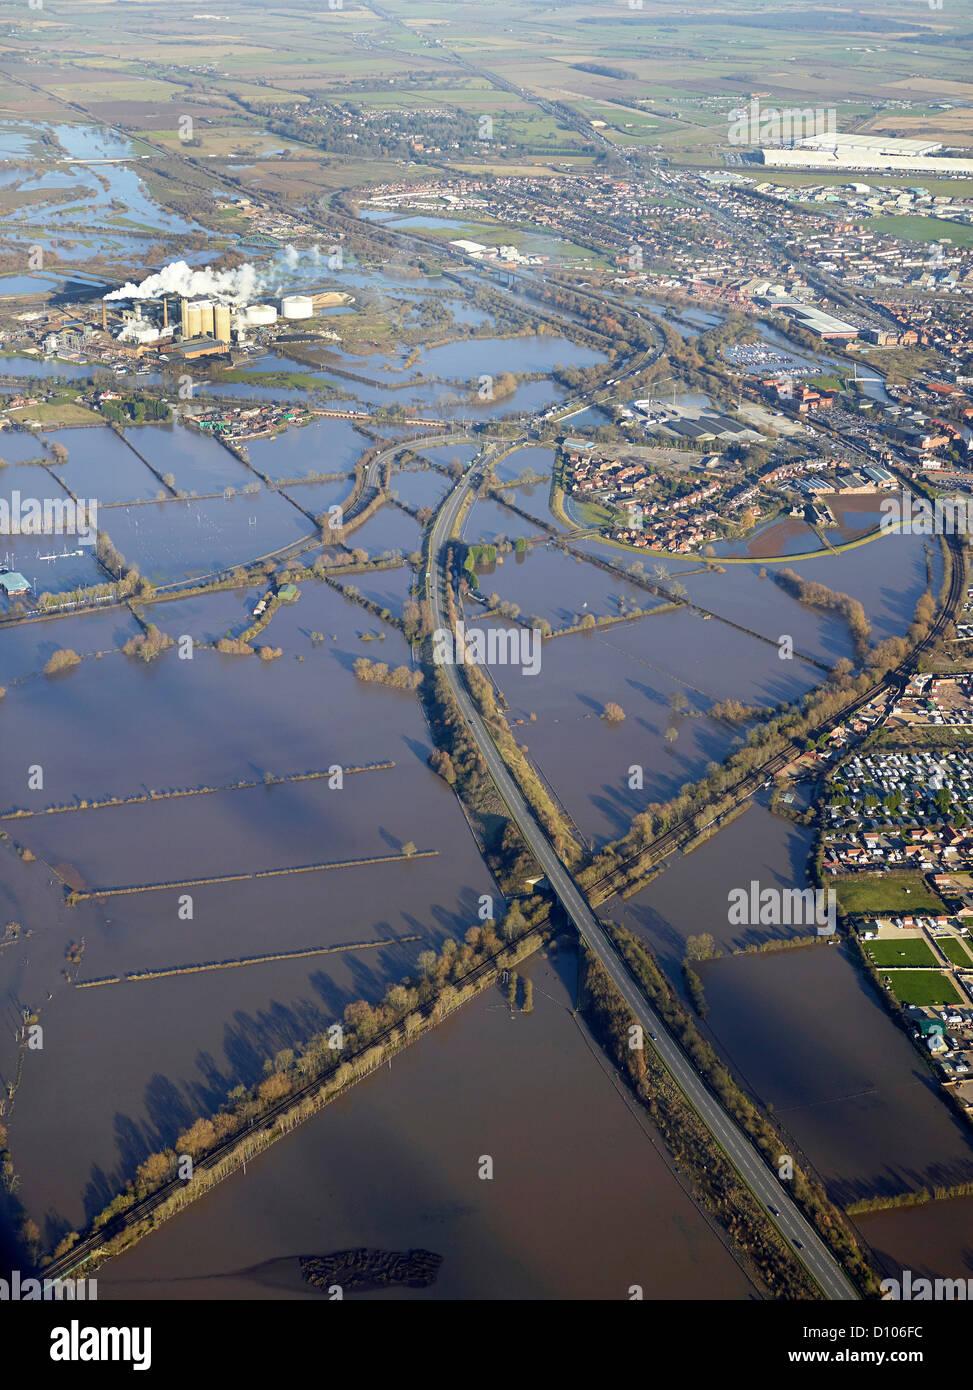 Flooding from the River Trent, Newark, Nottinghamshire, East Midlands, England, UK - Stock Image